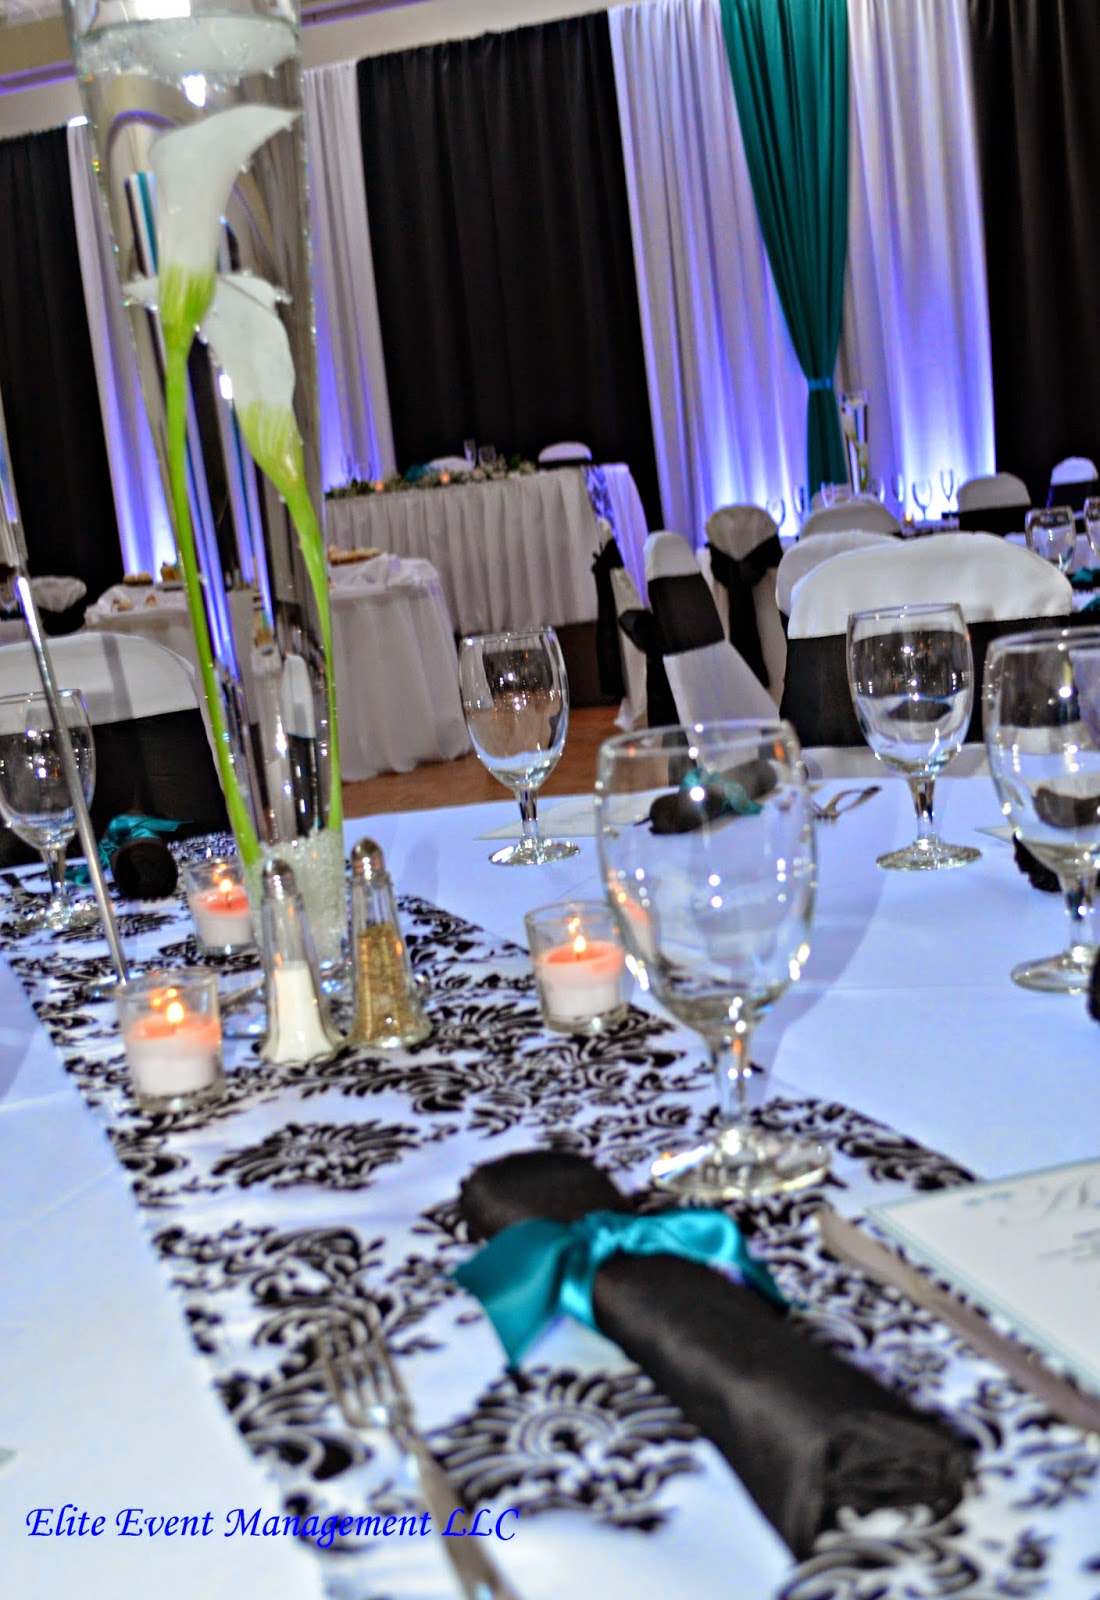 Celebrations: Teal, Black & White Wedding Decor